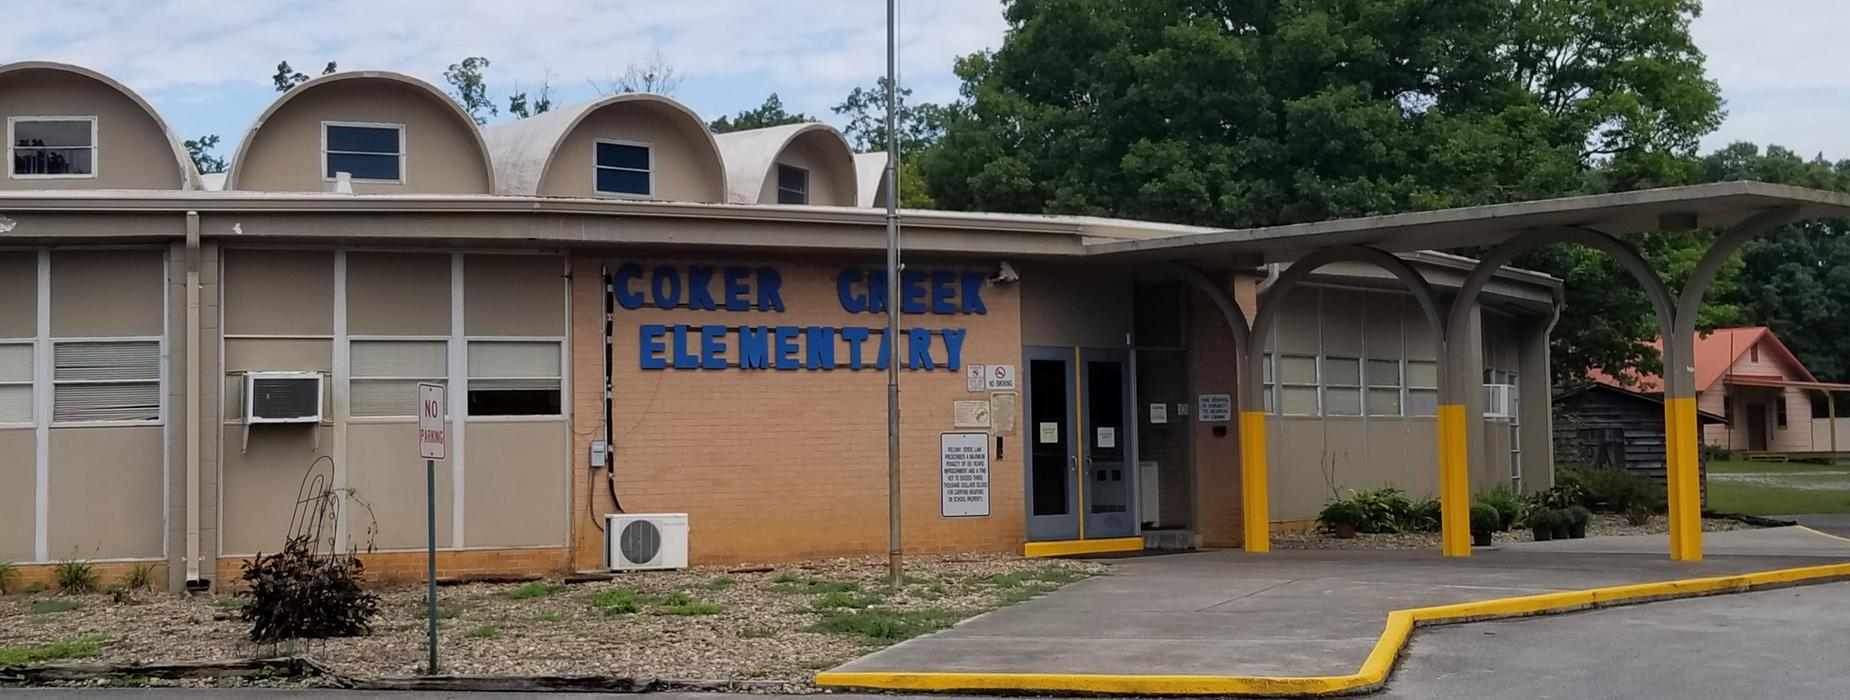 Coker Creek Elementary School building